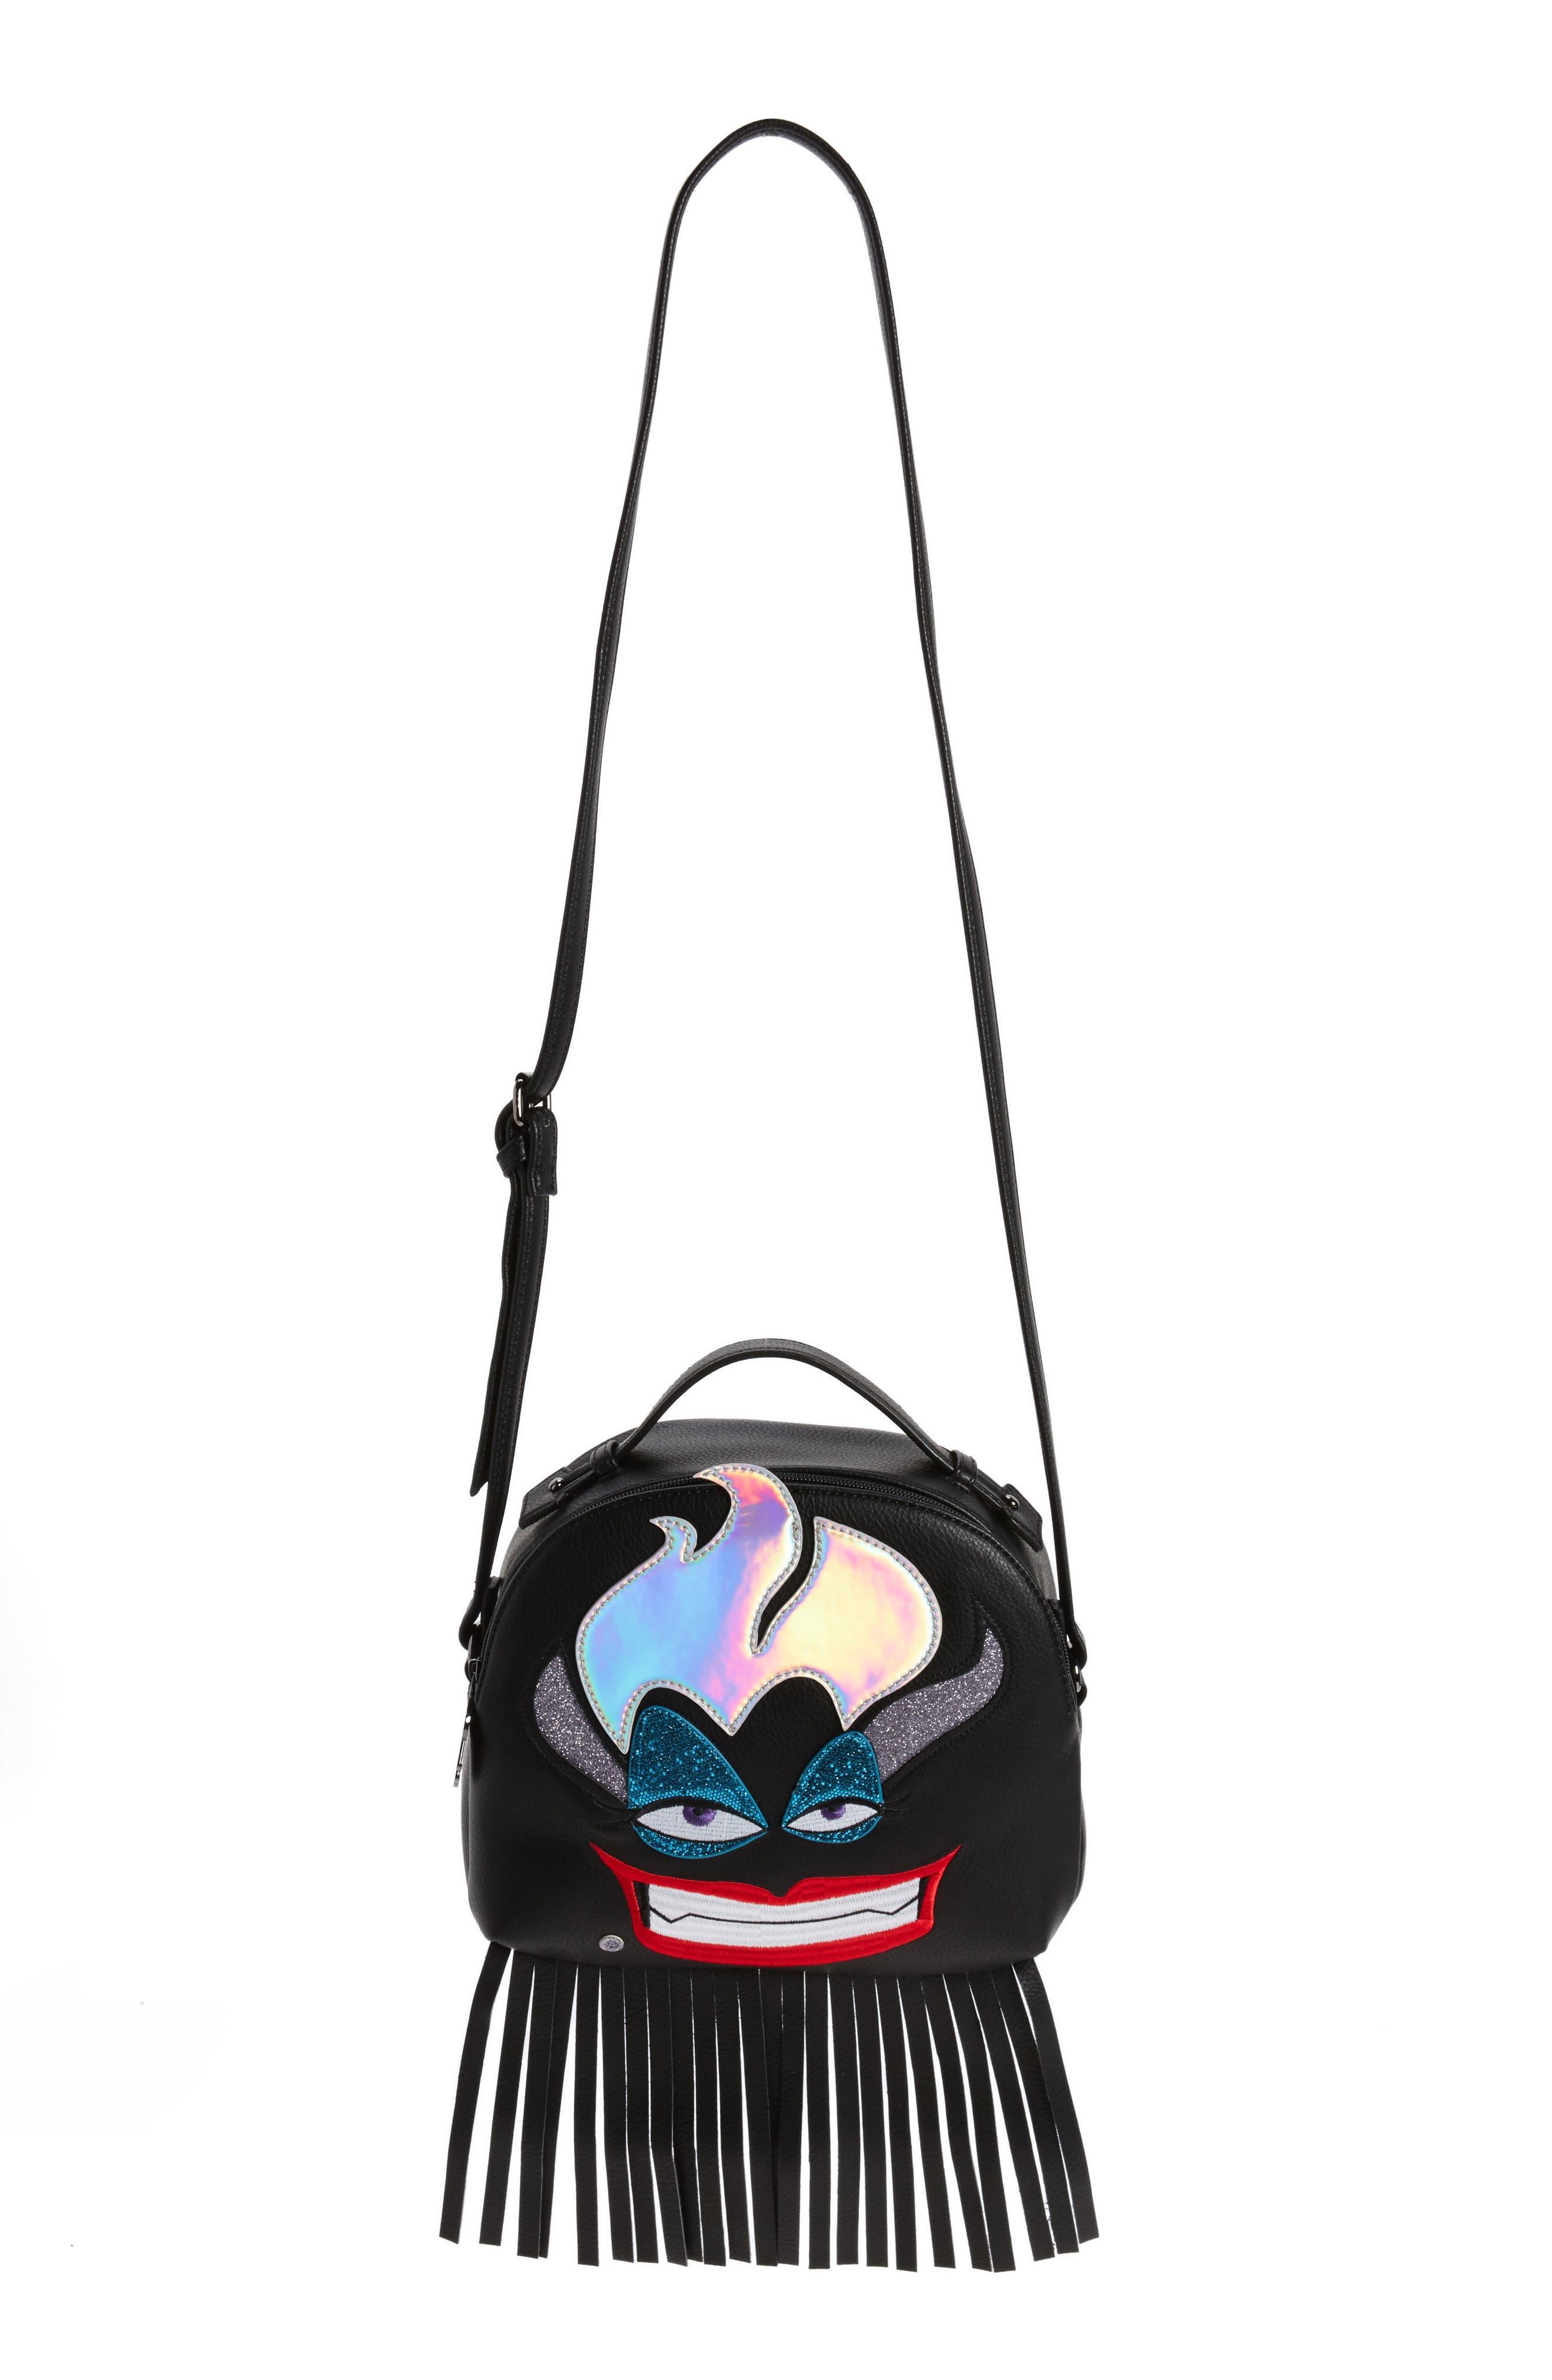 DANIELLE NICOLE x Disney<sup>®</sup> Ursula Faux Leather Crossbody Bag, Main, color, 001